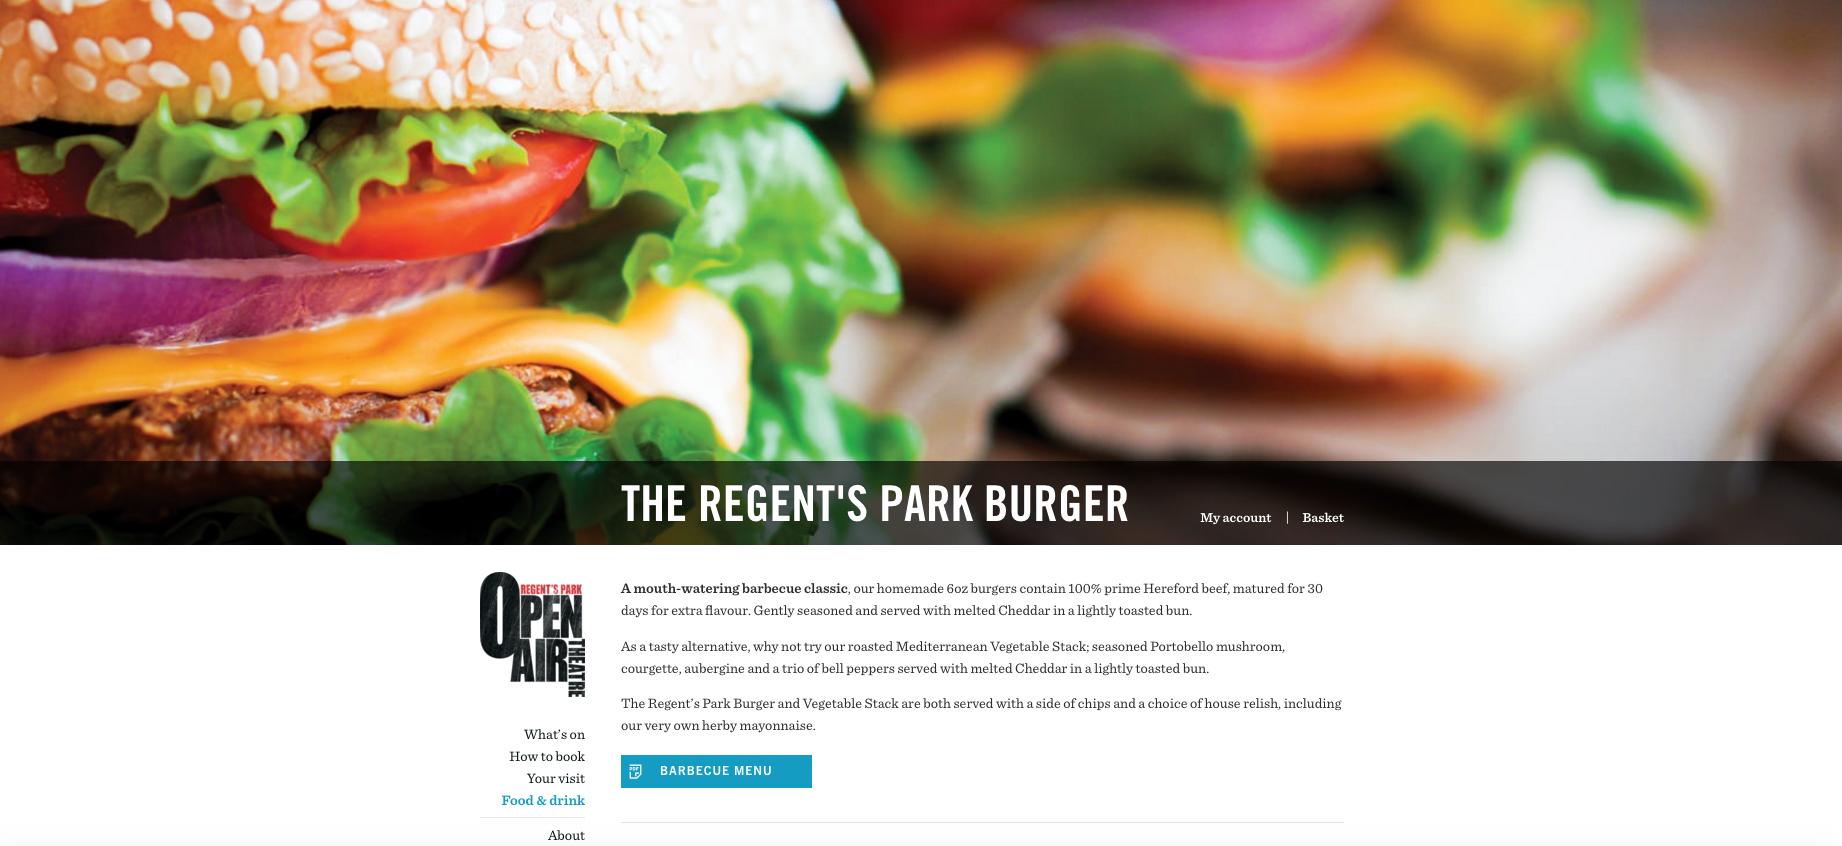 Regents Park Burger